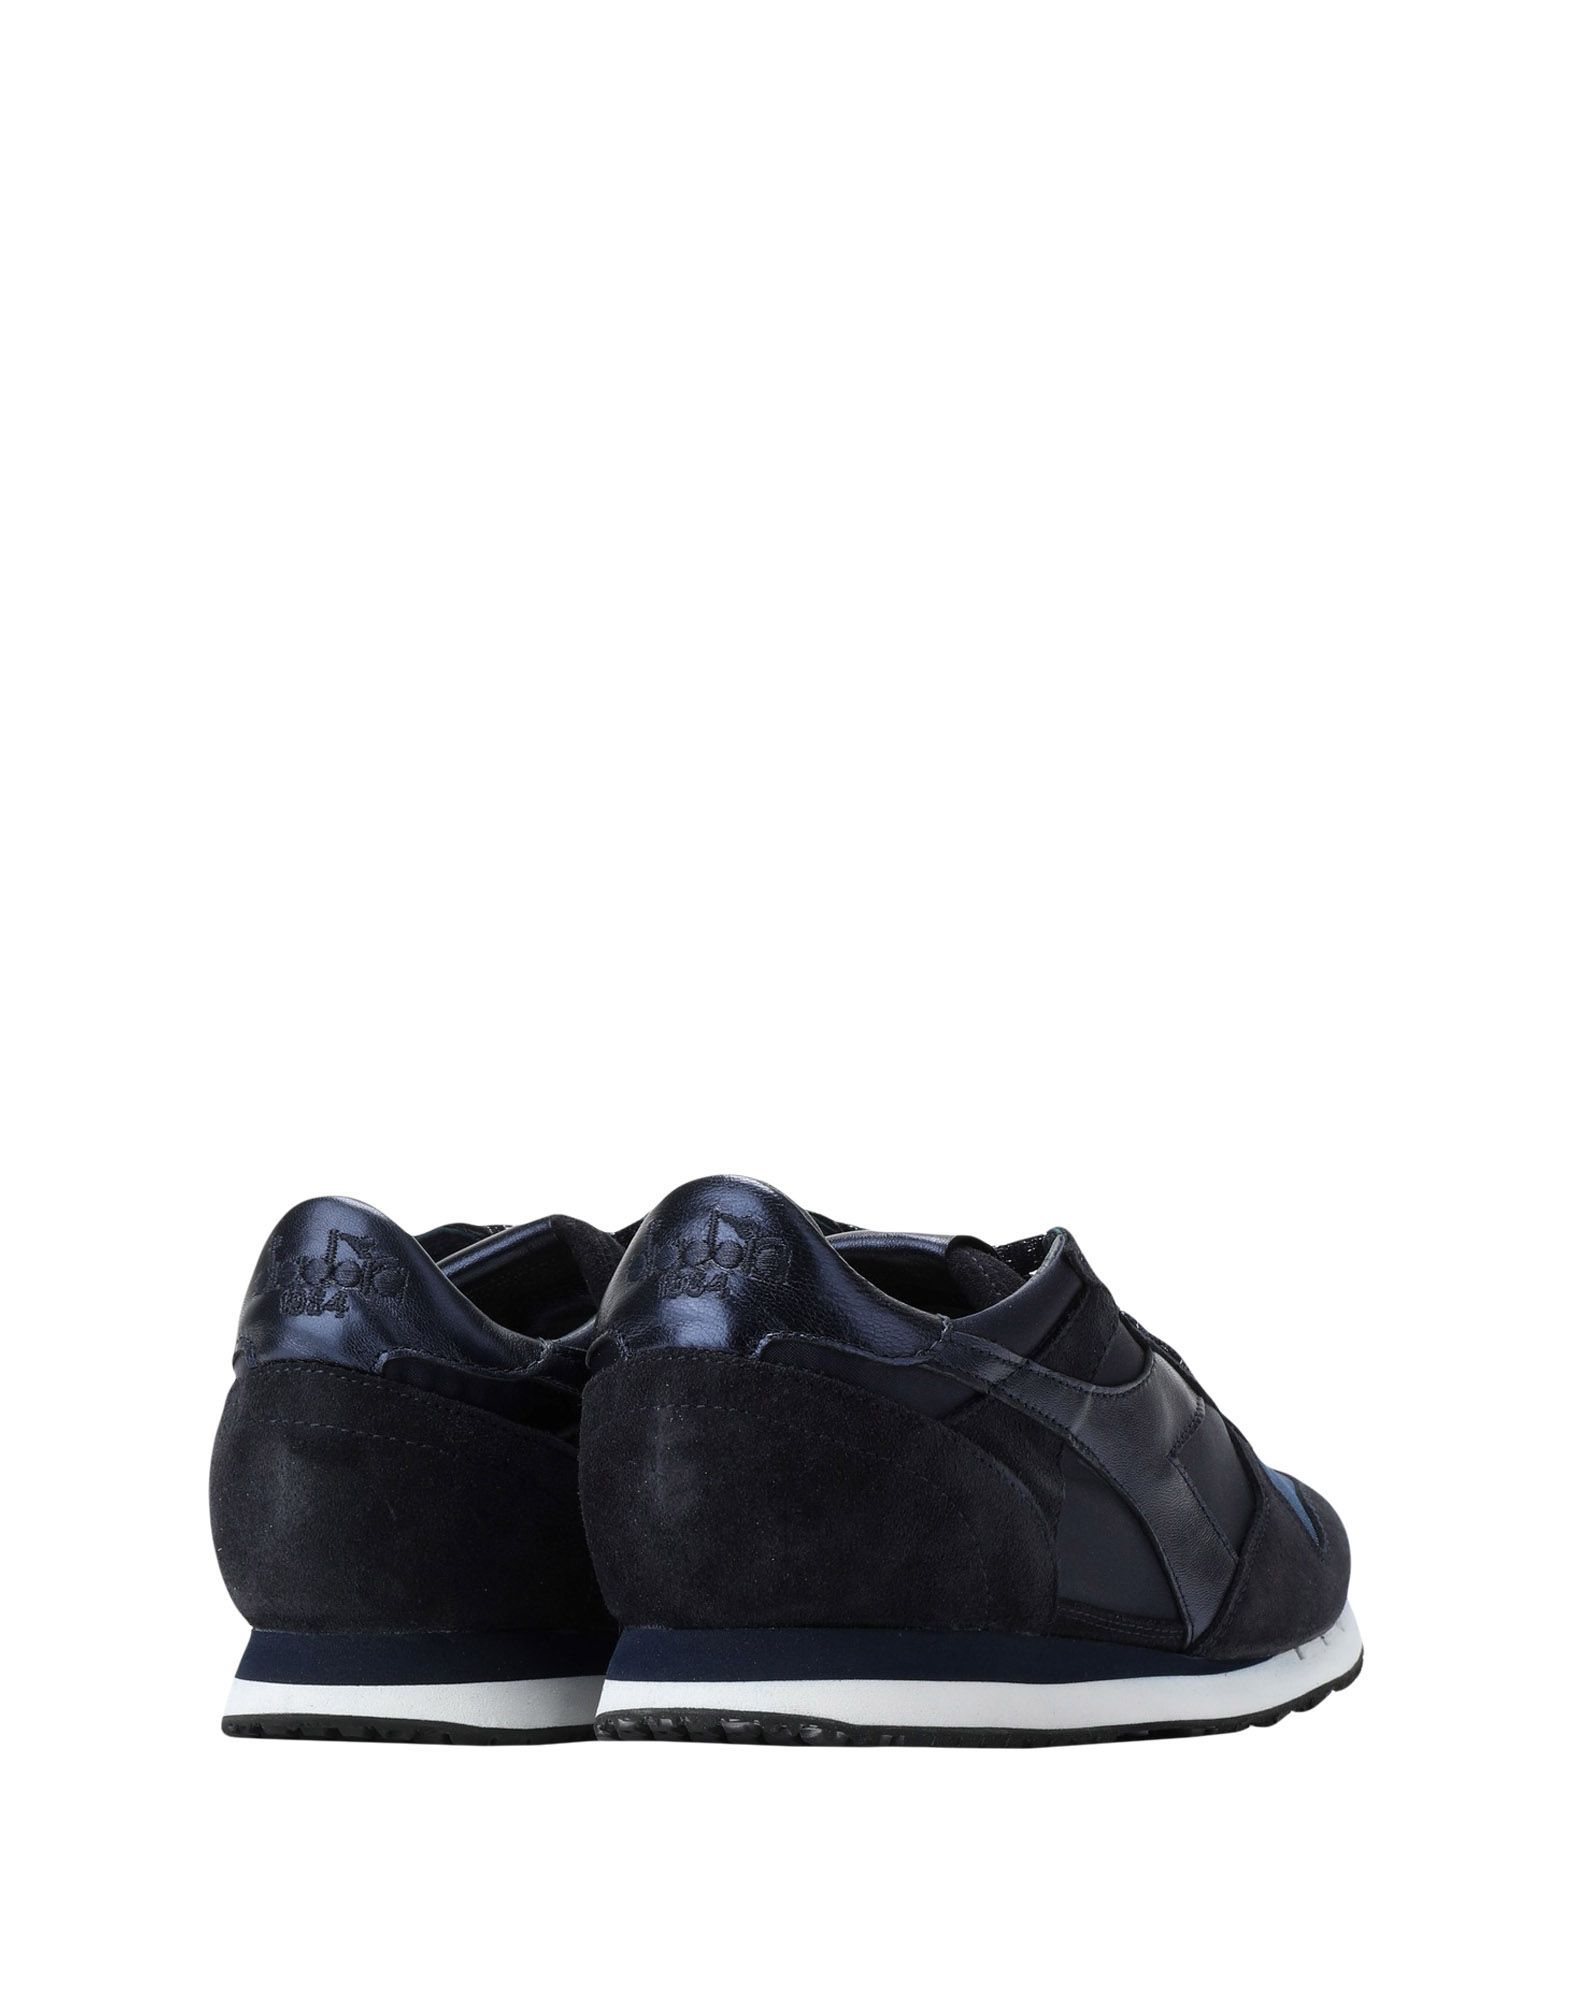 Stilvolle billige Schuhe Diadora  Heritage Trident W Niedrig Satin  Diadora 11353881WQ 4e9423